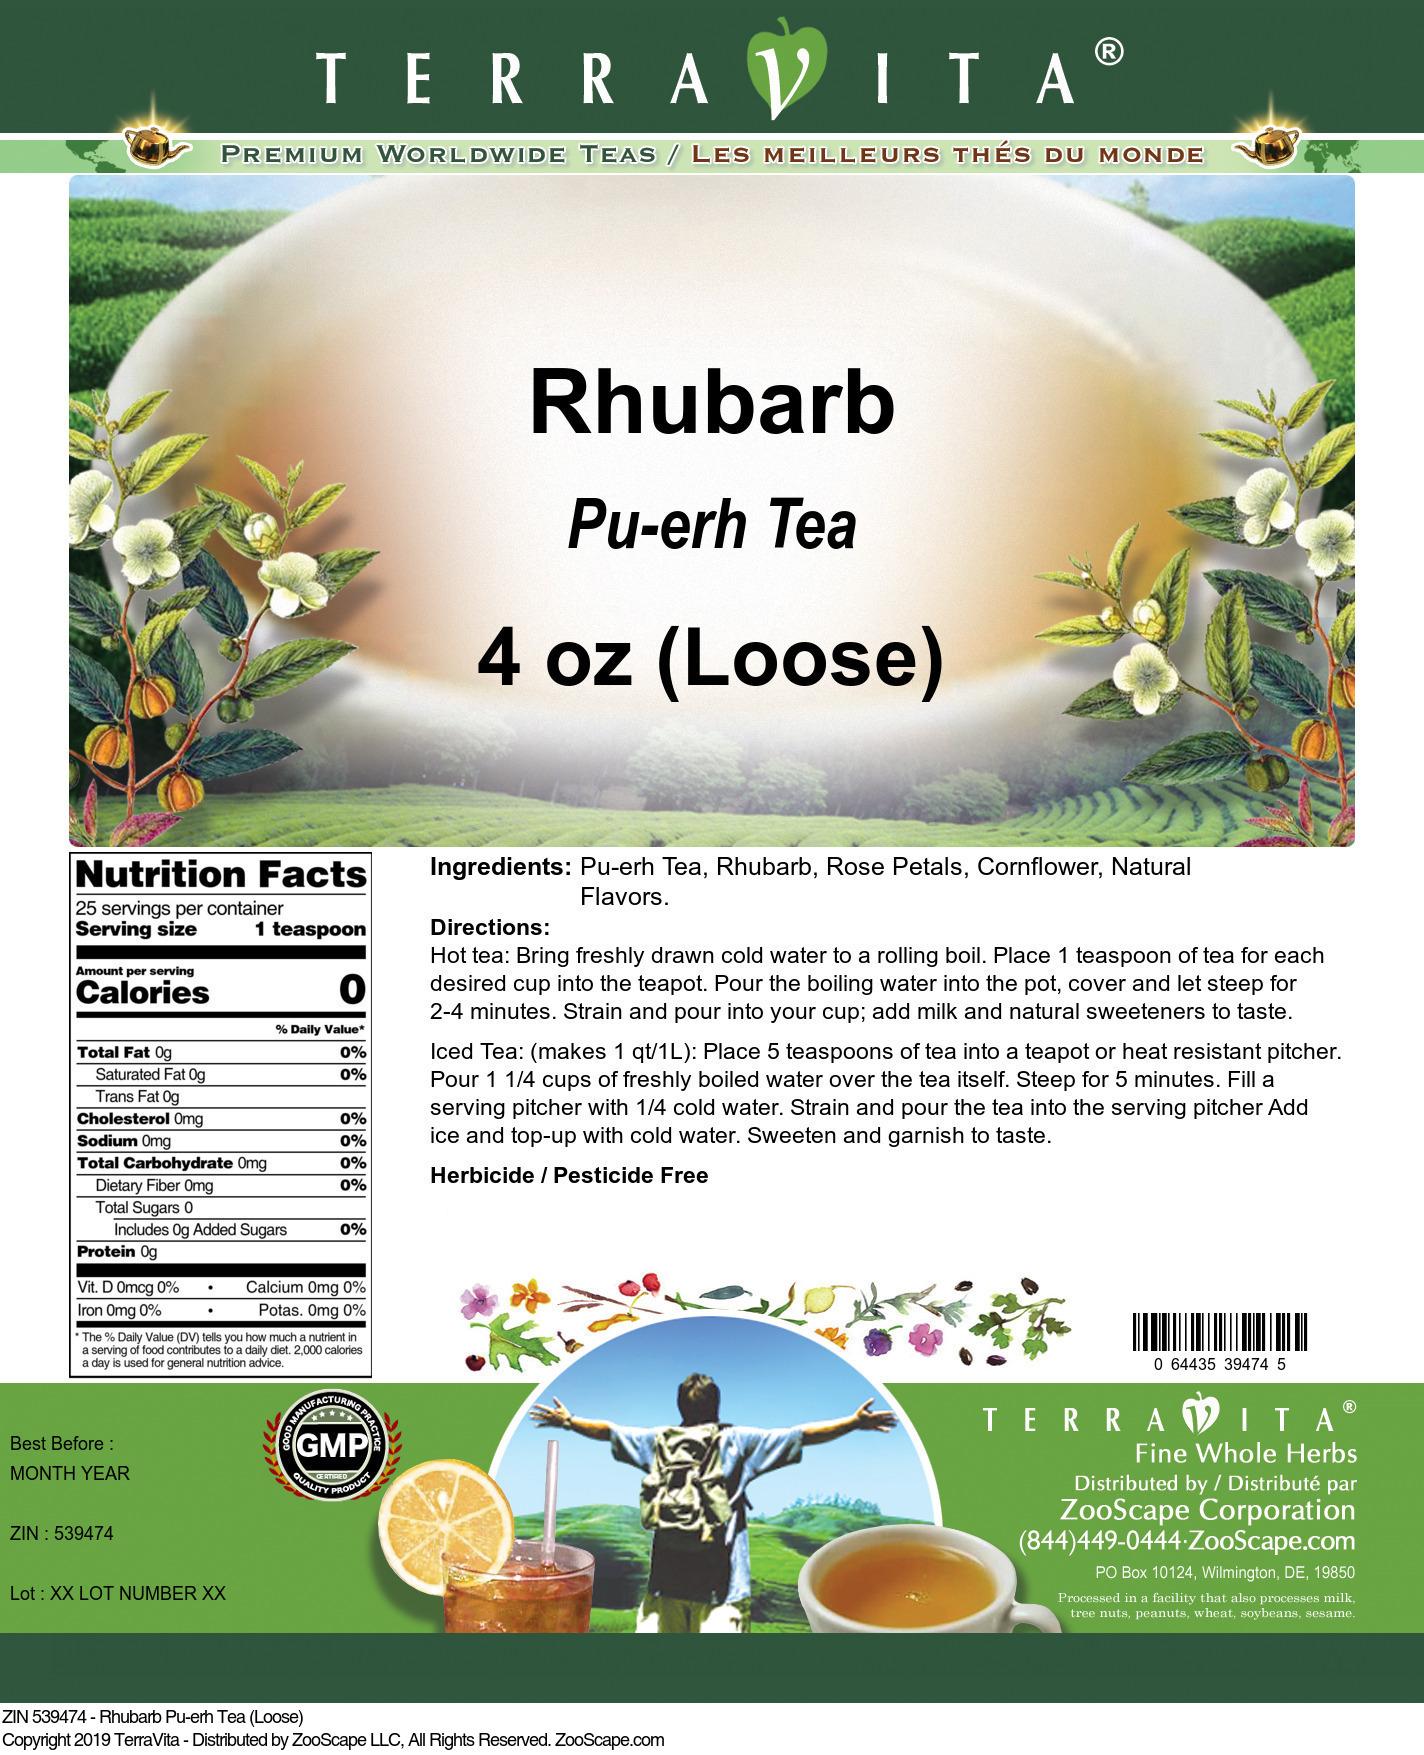 Rhubarb Pu-erh Tea